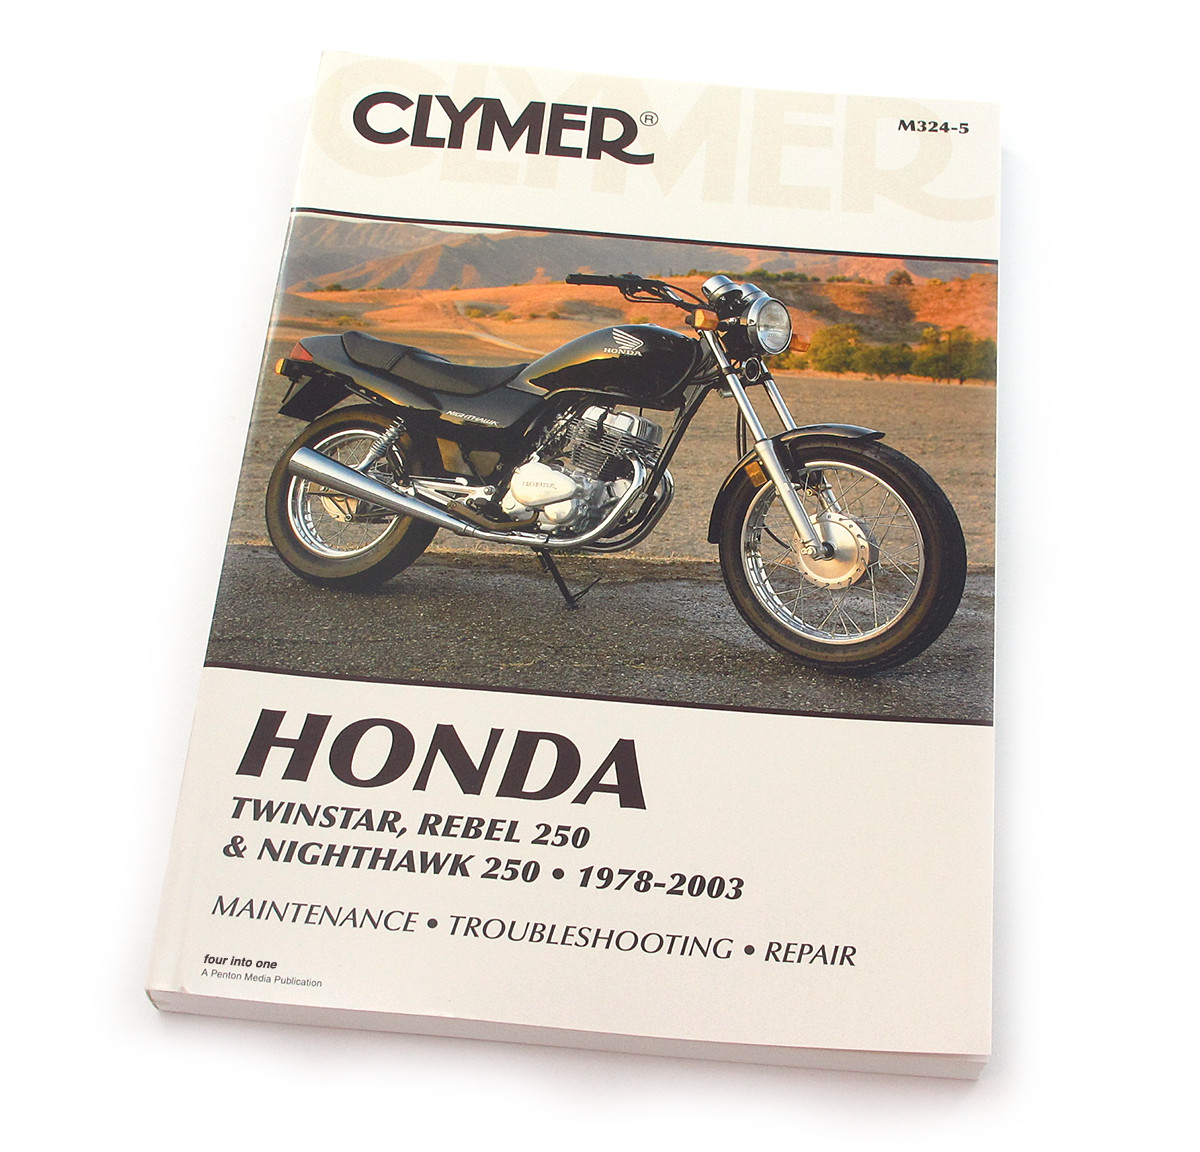 clymer manual honda twinstar rebel 250 nighthawk 250 1978 2003 rh 4into1 com 86 honda rebel 250 service manual 1986 Honda Rebel 250 Specs